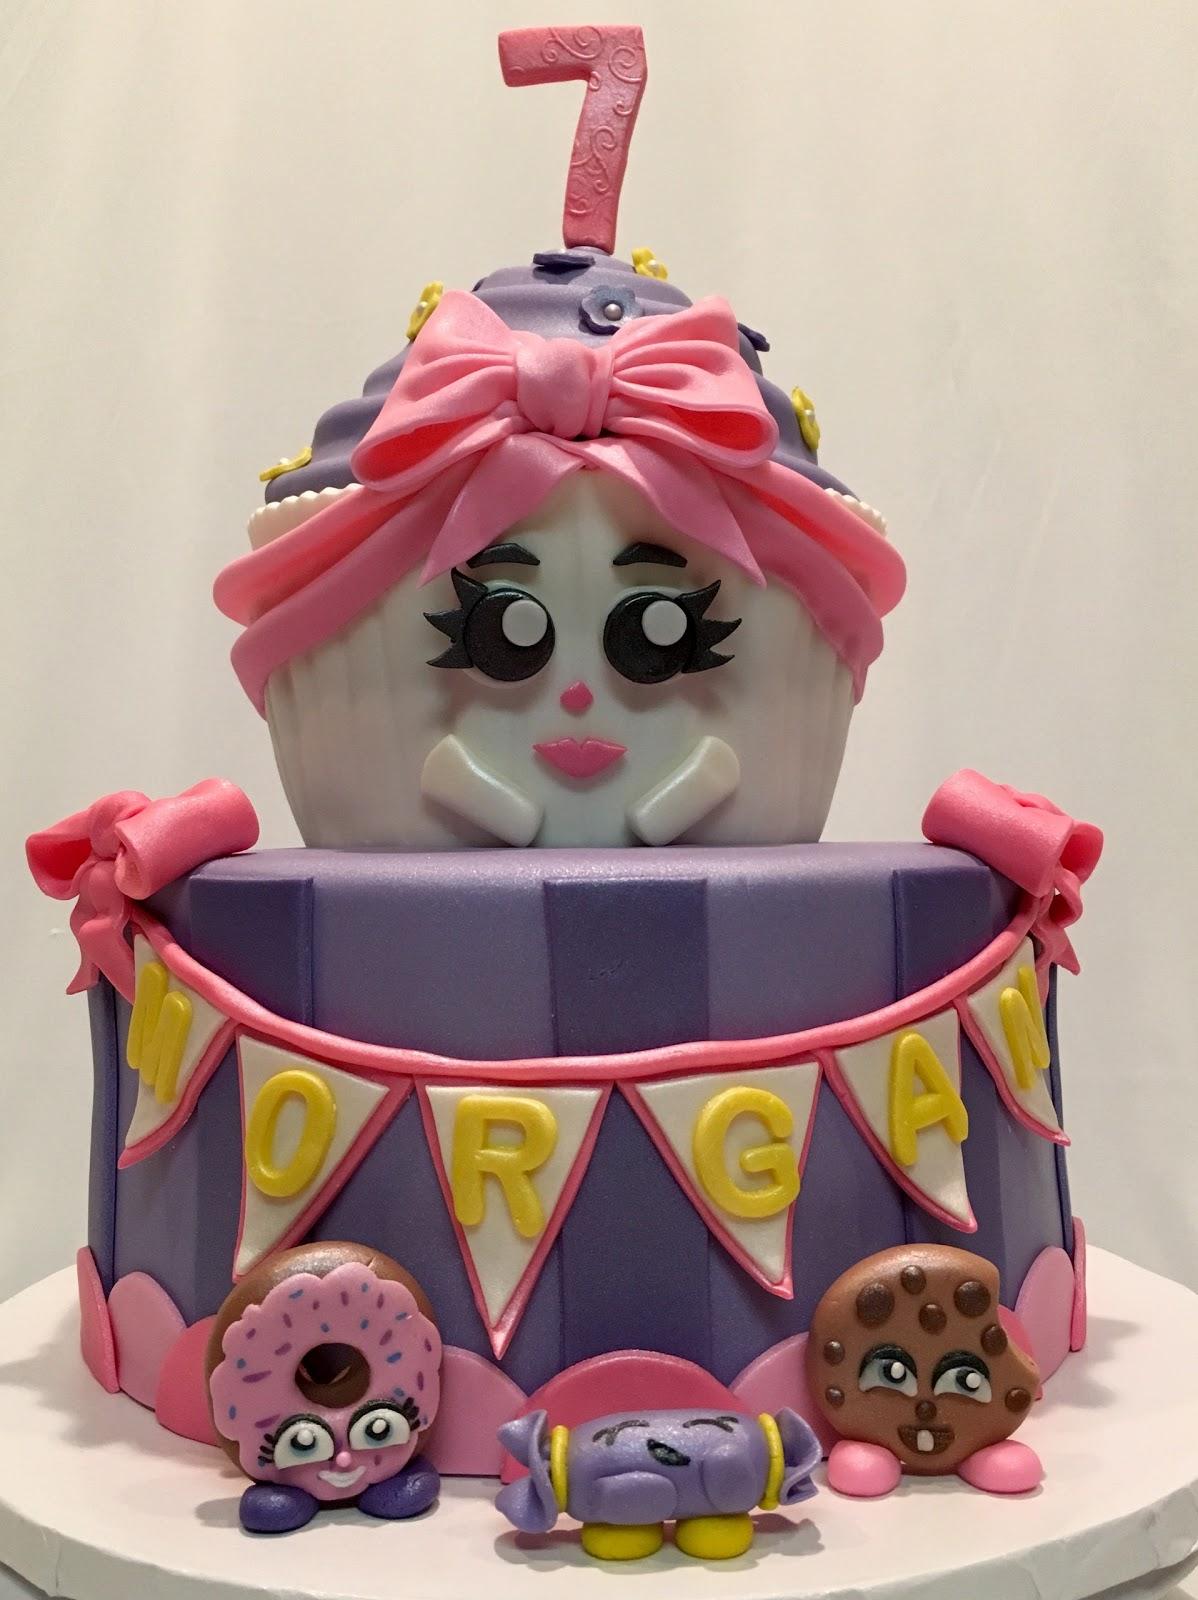 MyMoniCakes Shopkins Cupcake Cake With Fondant Mini Shopkins